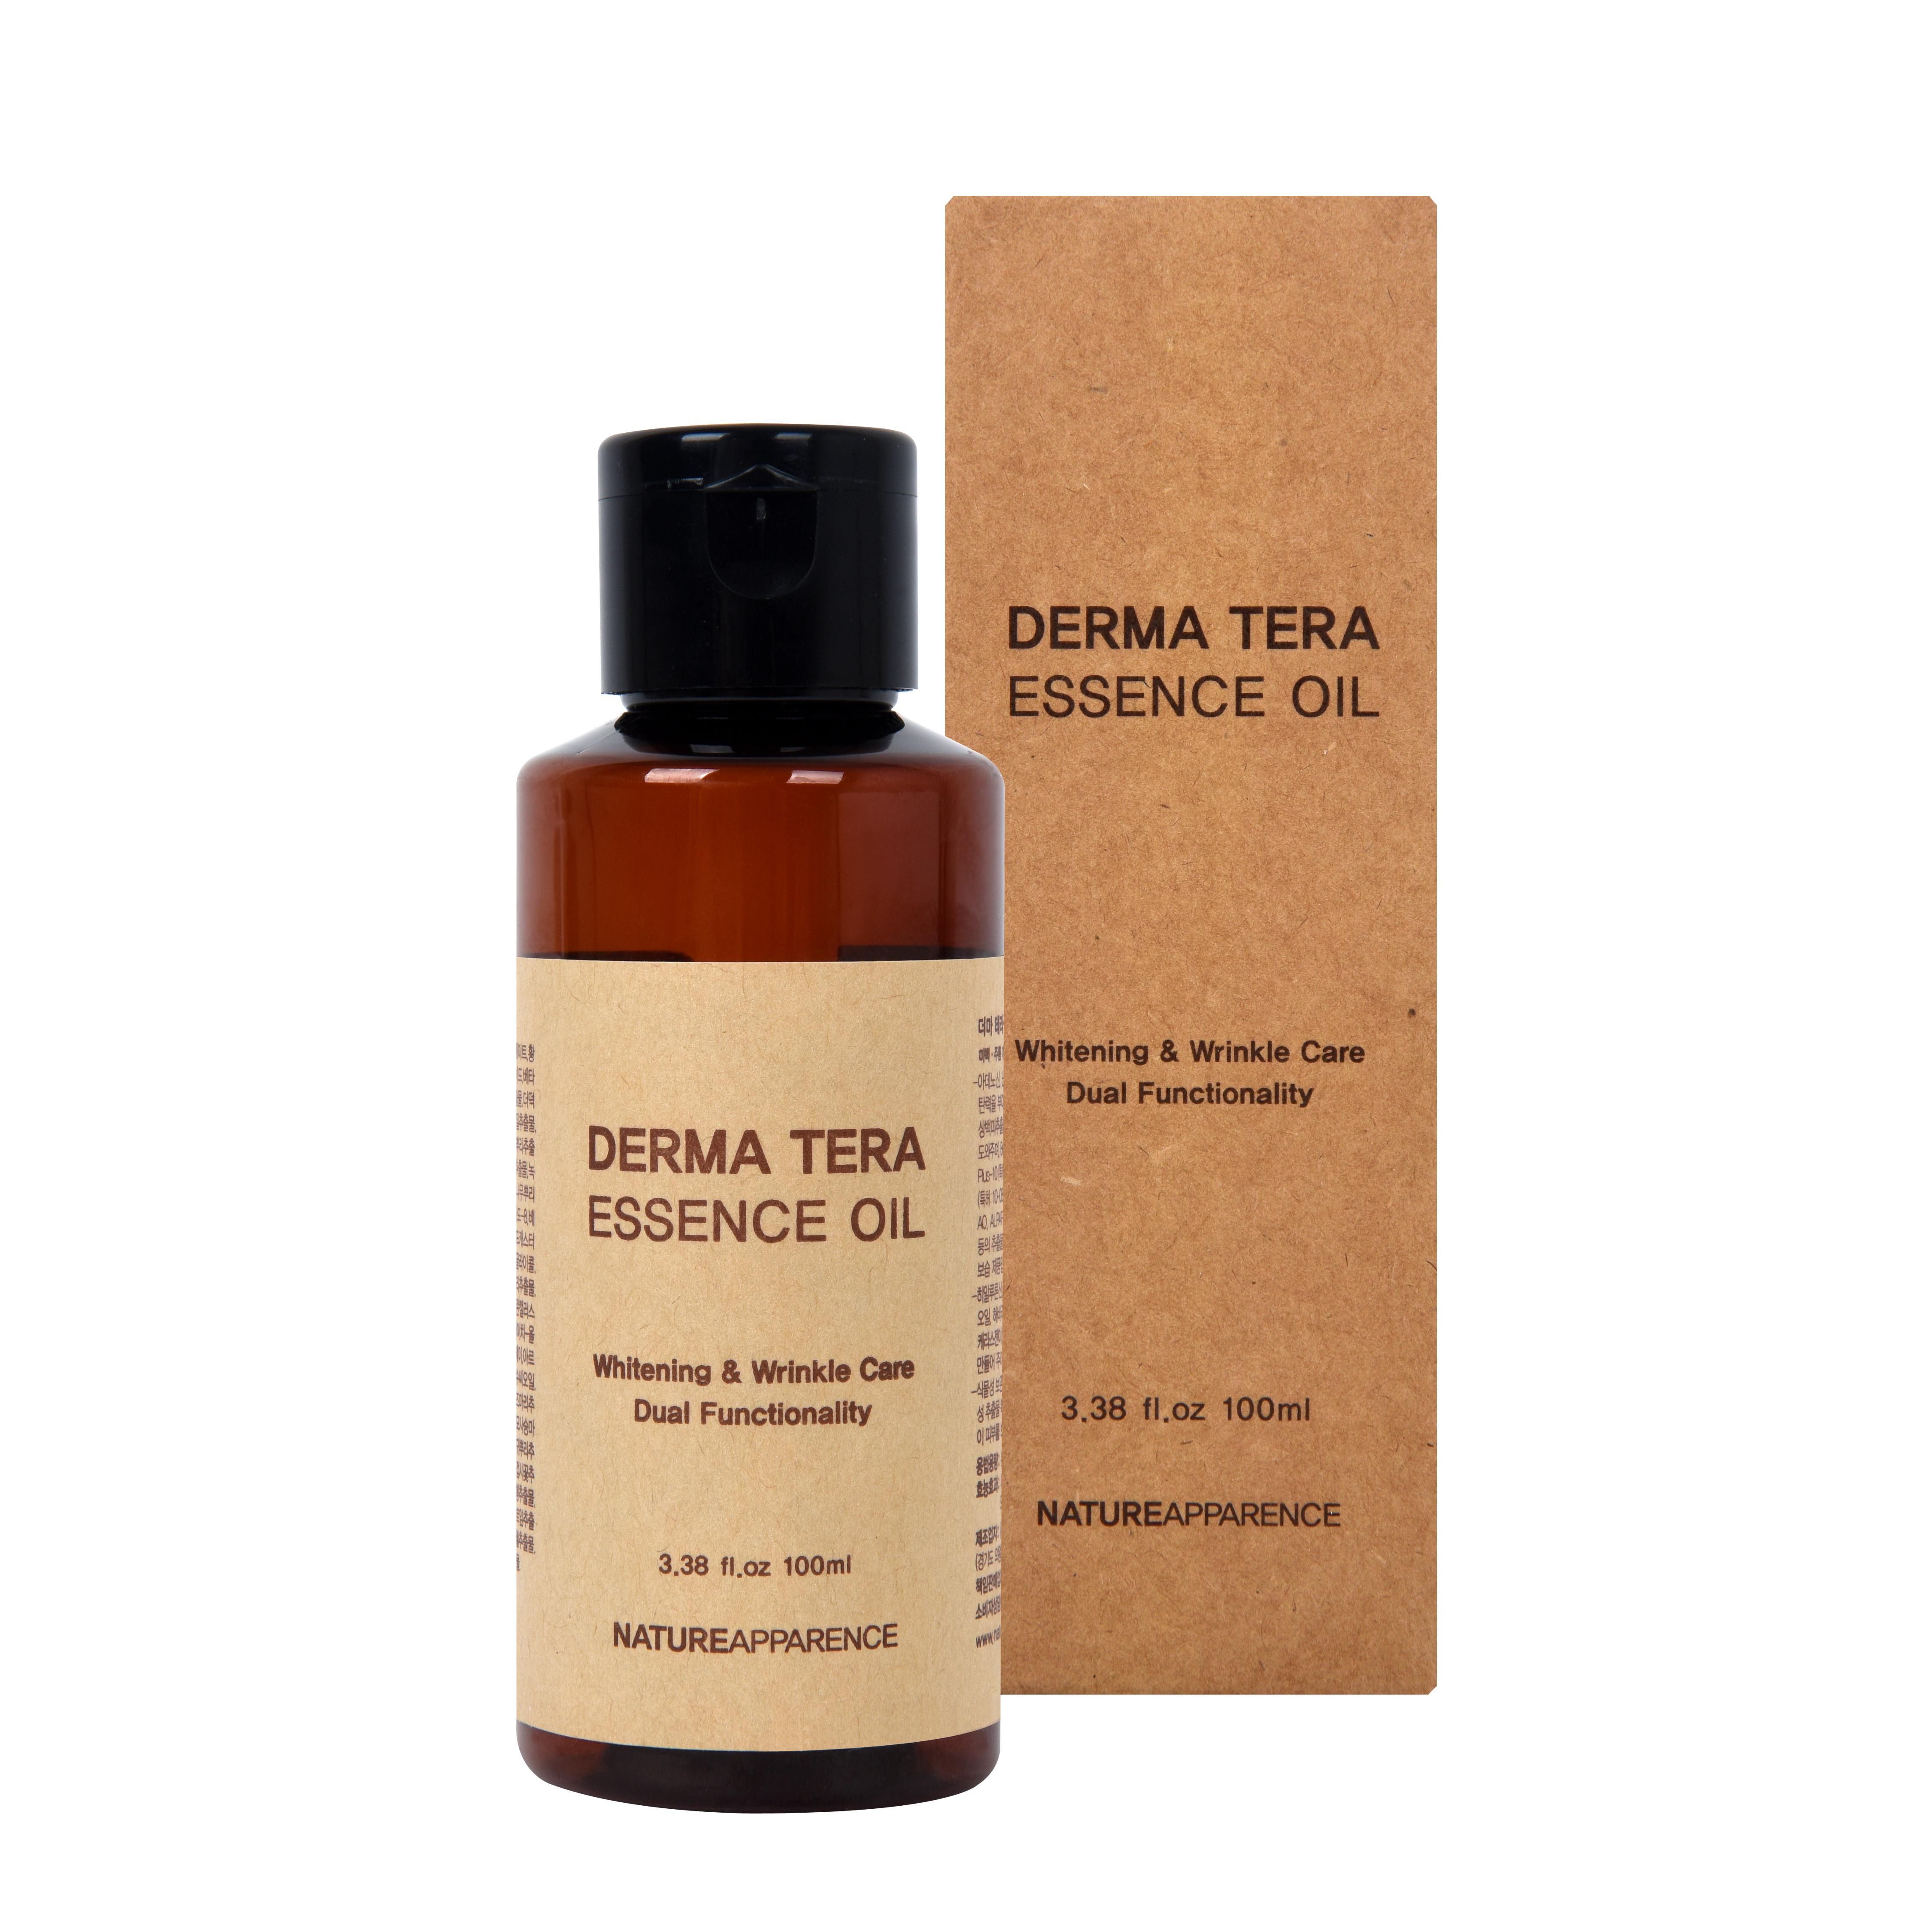 Derma tera essence